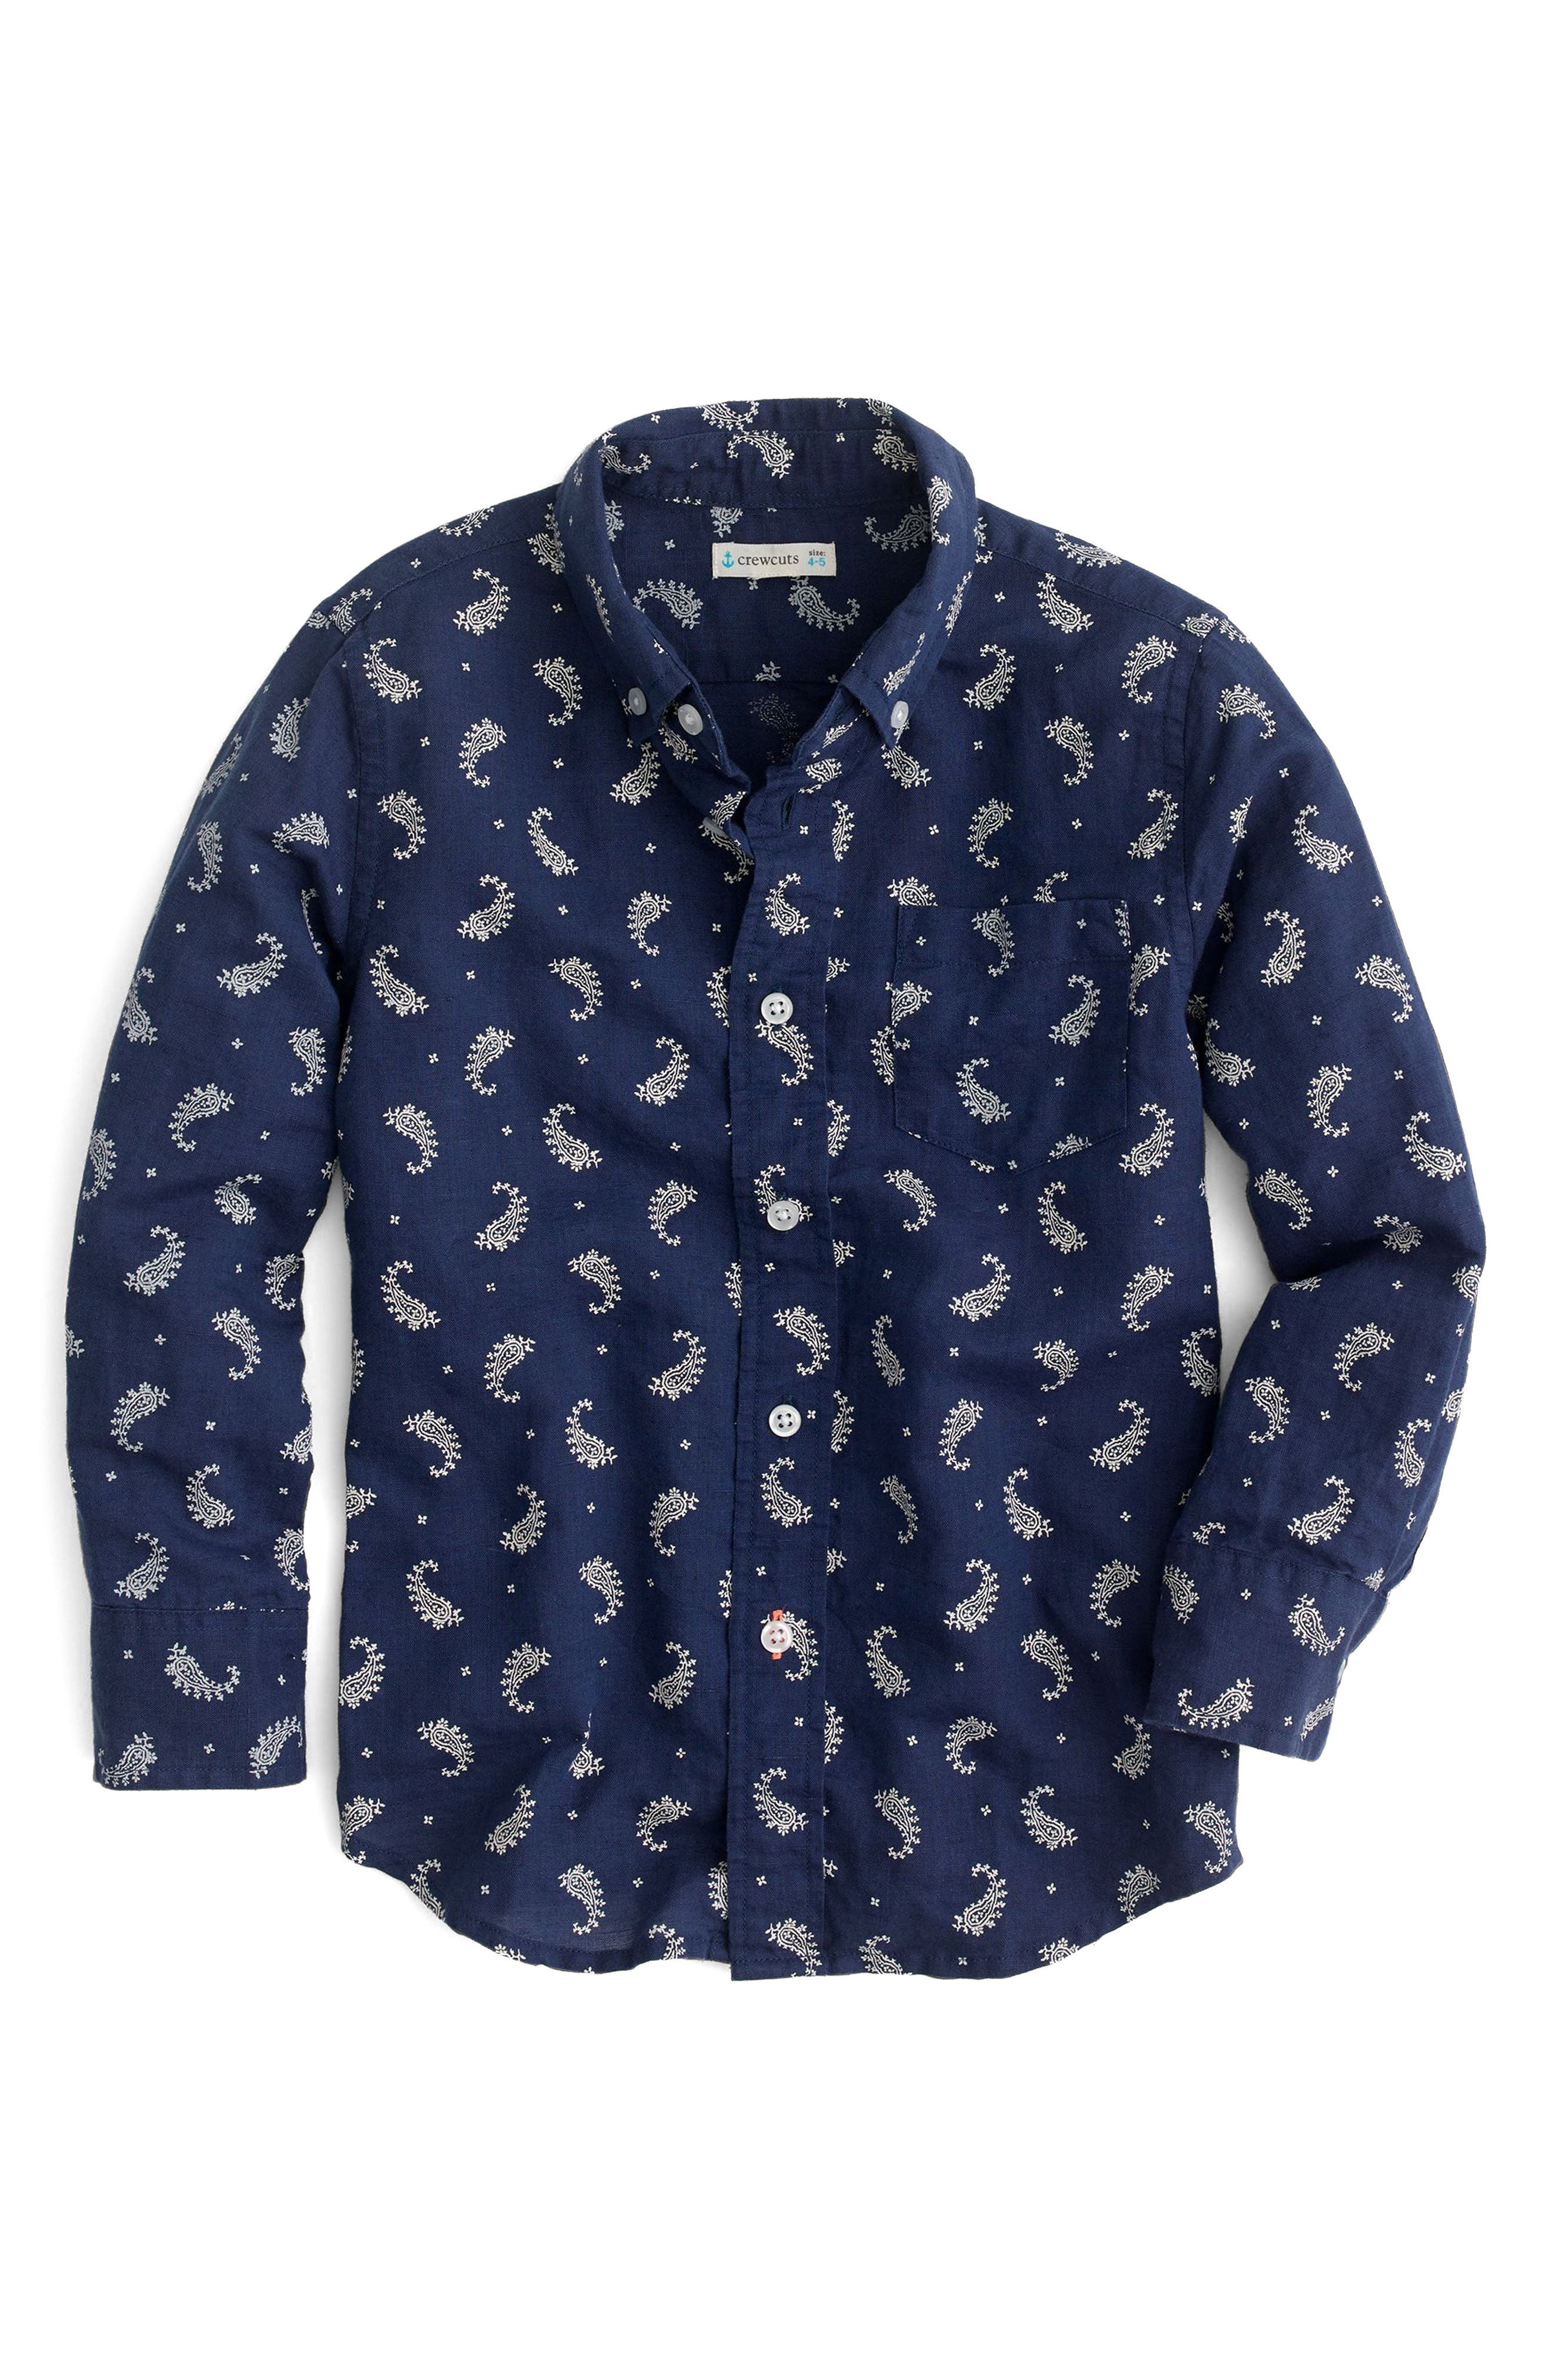 Paisley Print Cotton & Linen Dress Shirt,                         Main,                         color, Indigo Bandana